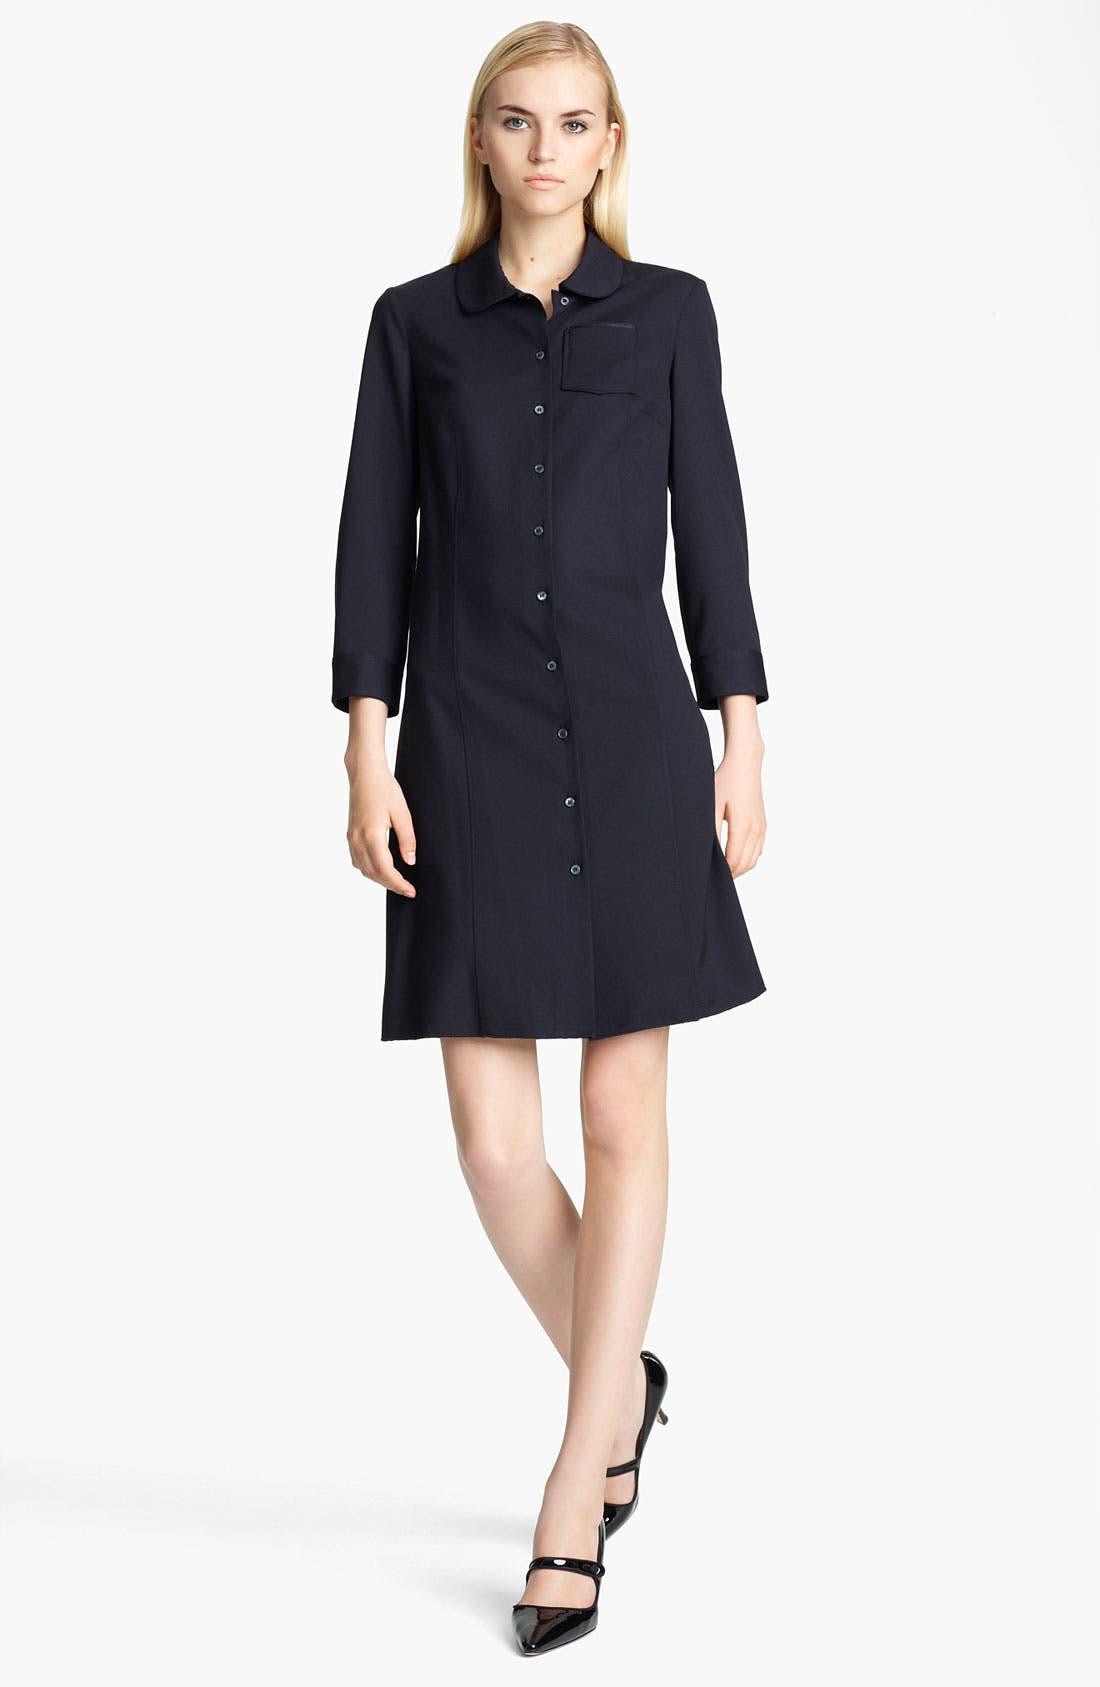 Main Image - Jil Sander Navy Stretch Wool Shirtdress